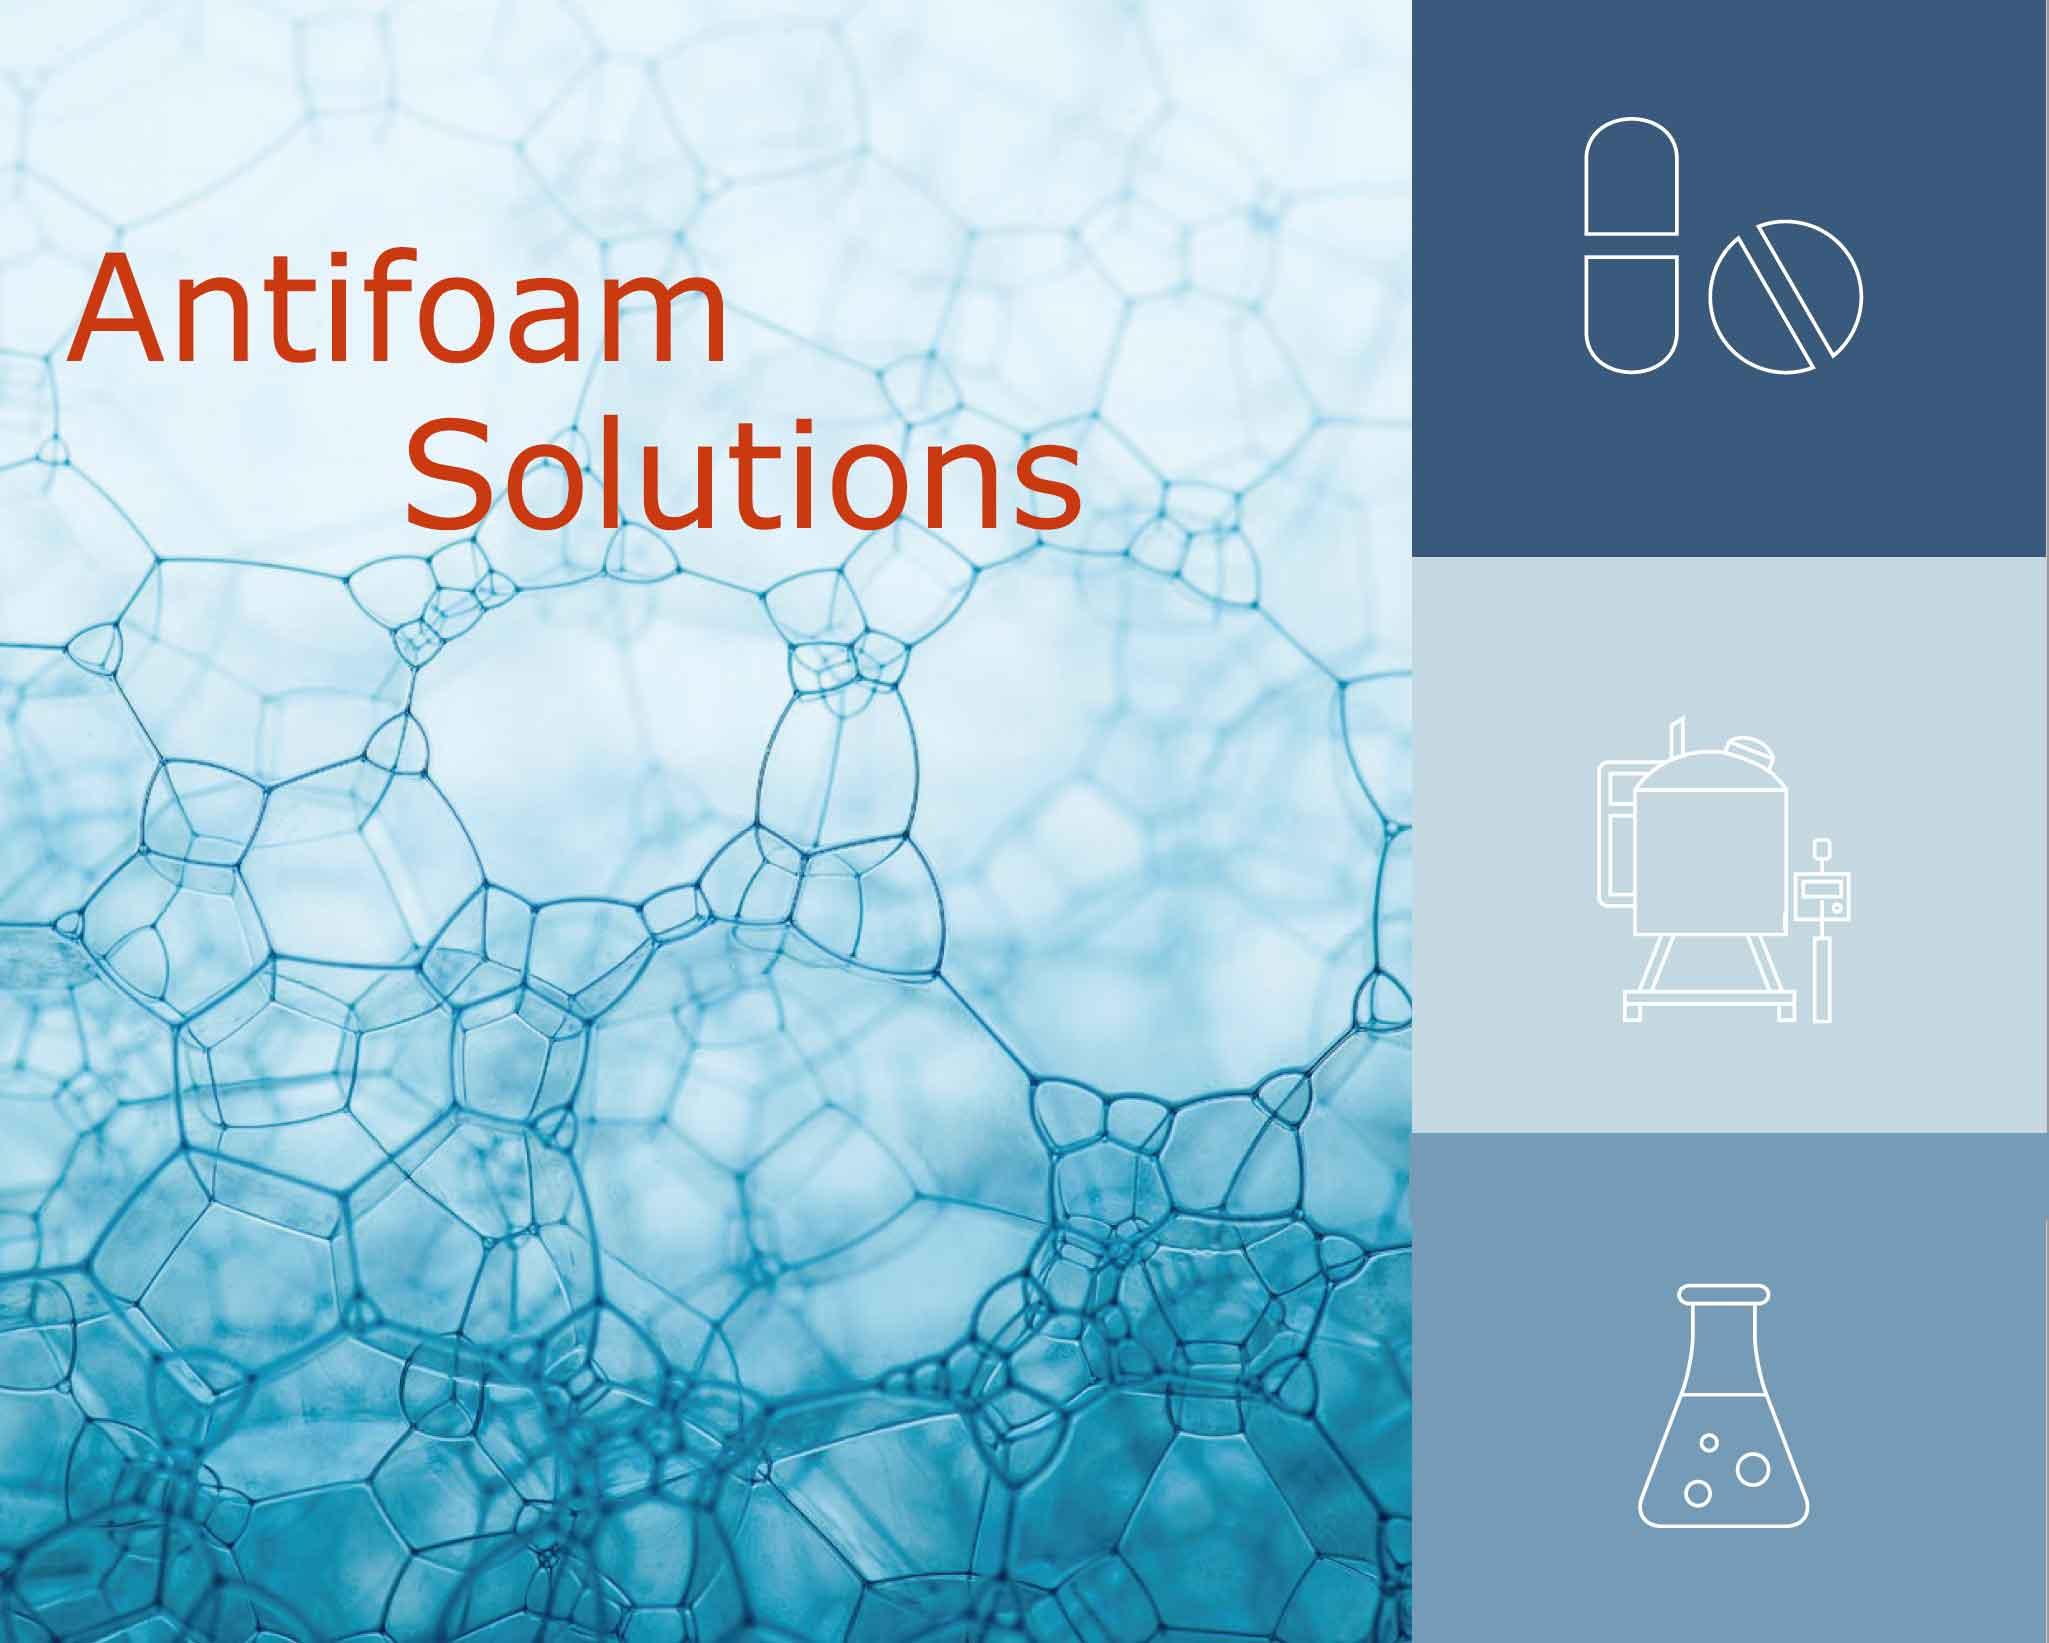 Antifoam-Solutions-Biesterfeld-Lindberg-lund-Banner